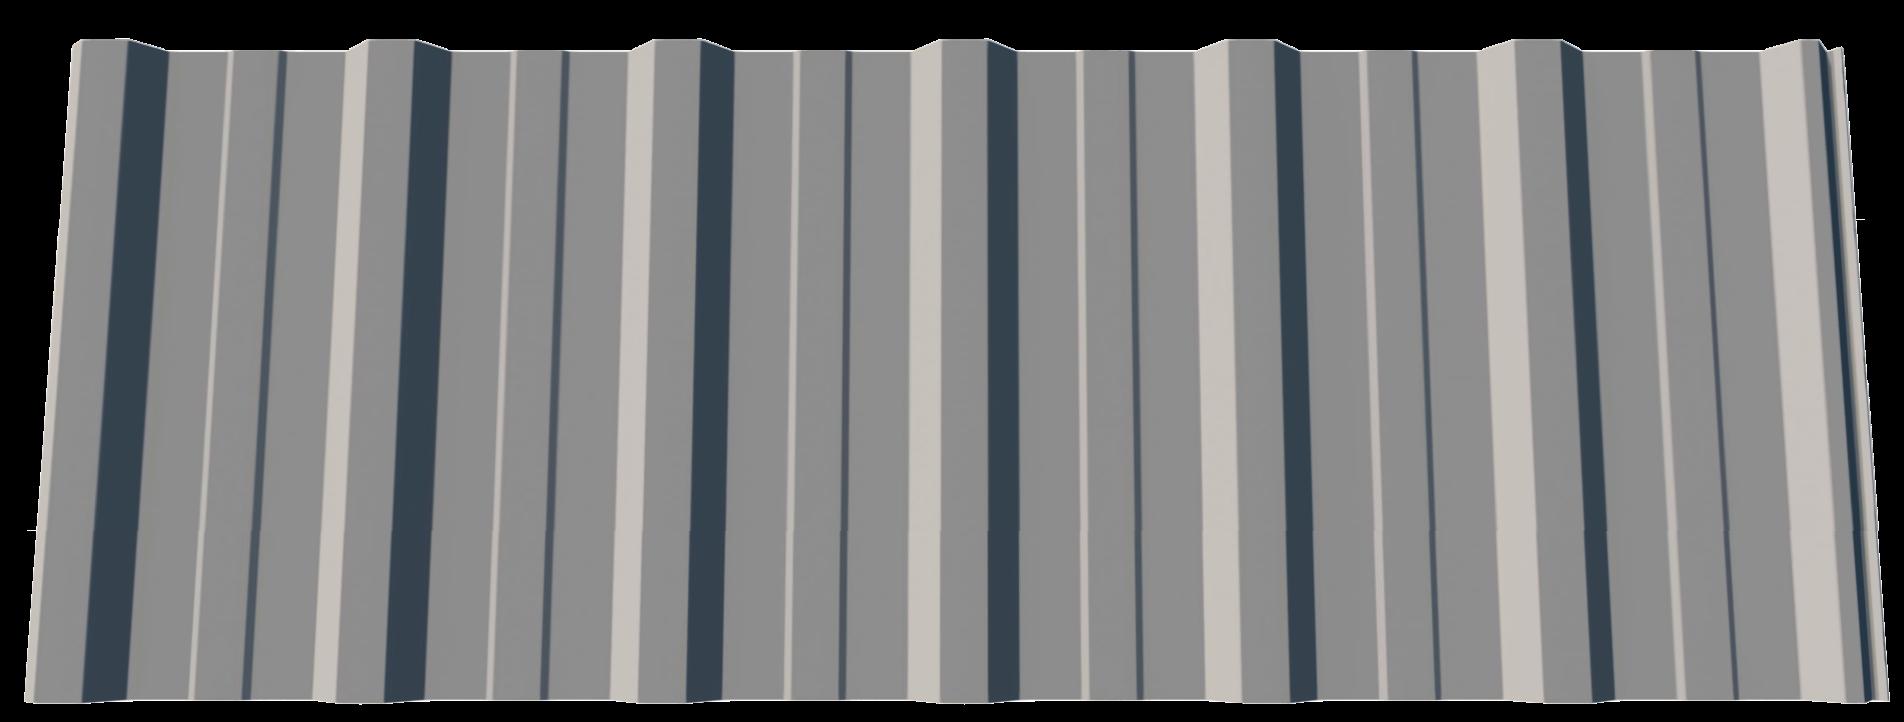 Trapezbleche T18 Dach